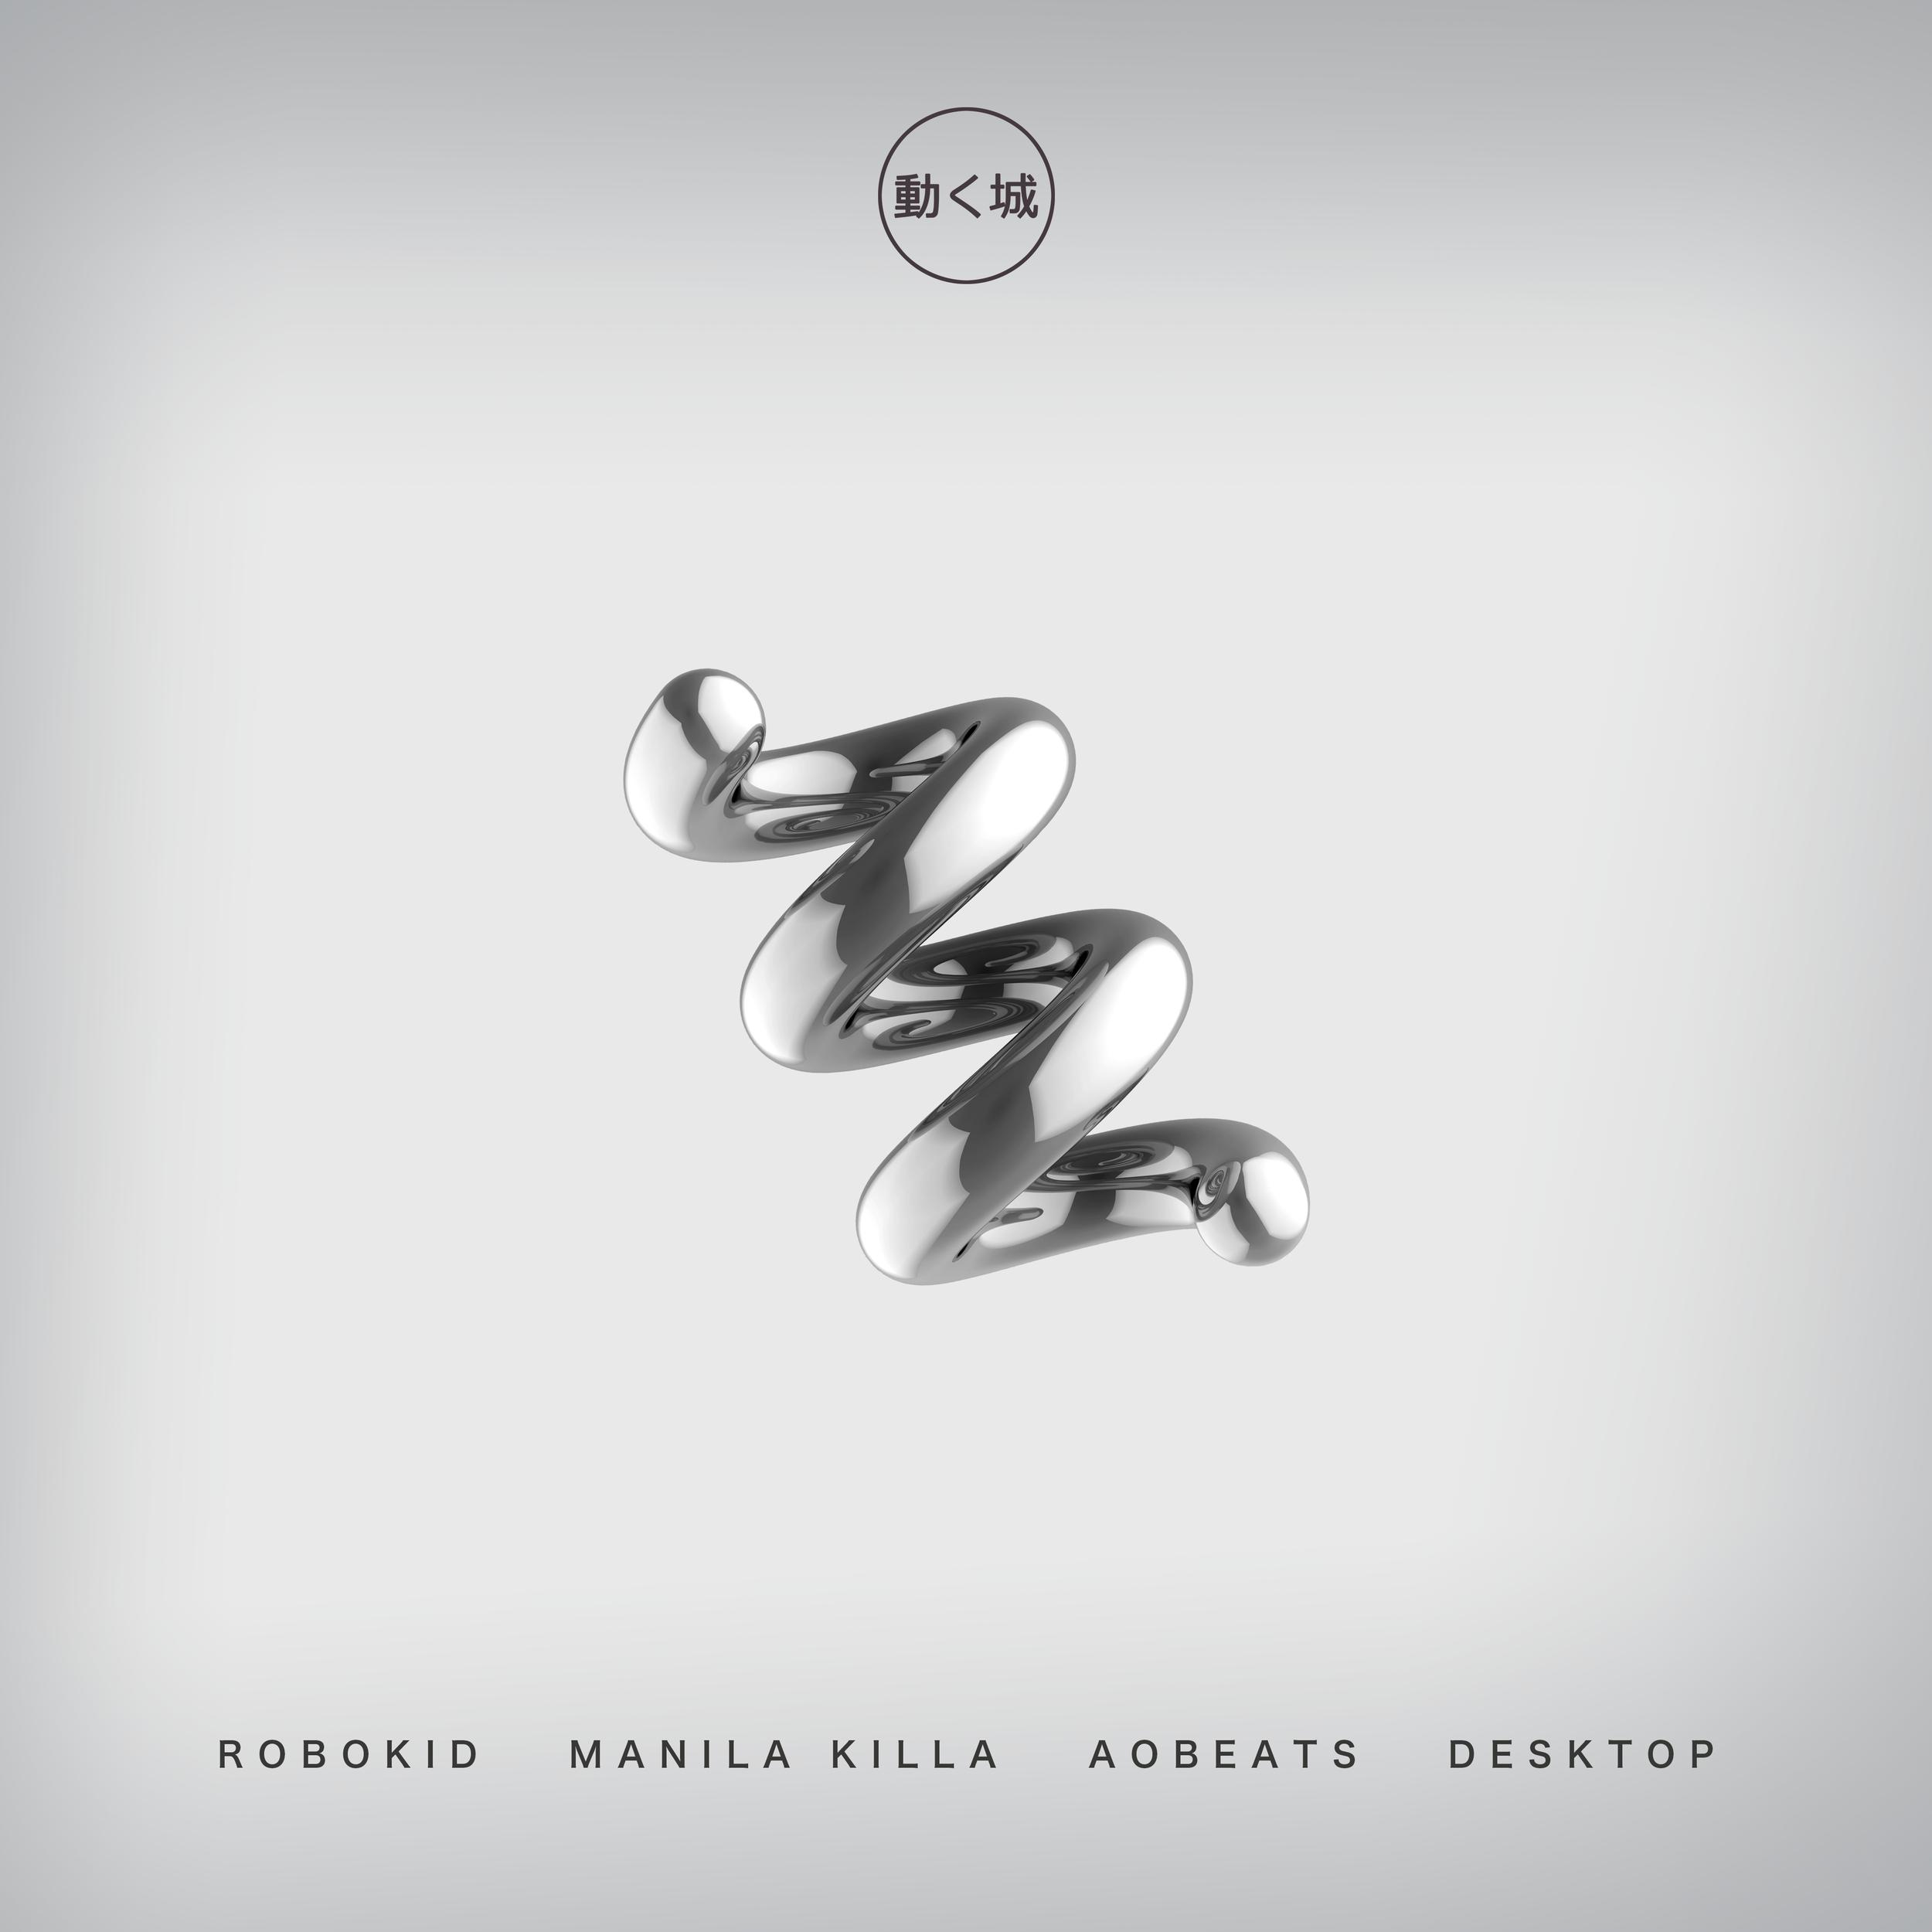 Helix 2.0 (feat. Blaise Railey) - Robokid, Manila Killa, AObeats